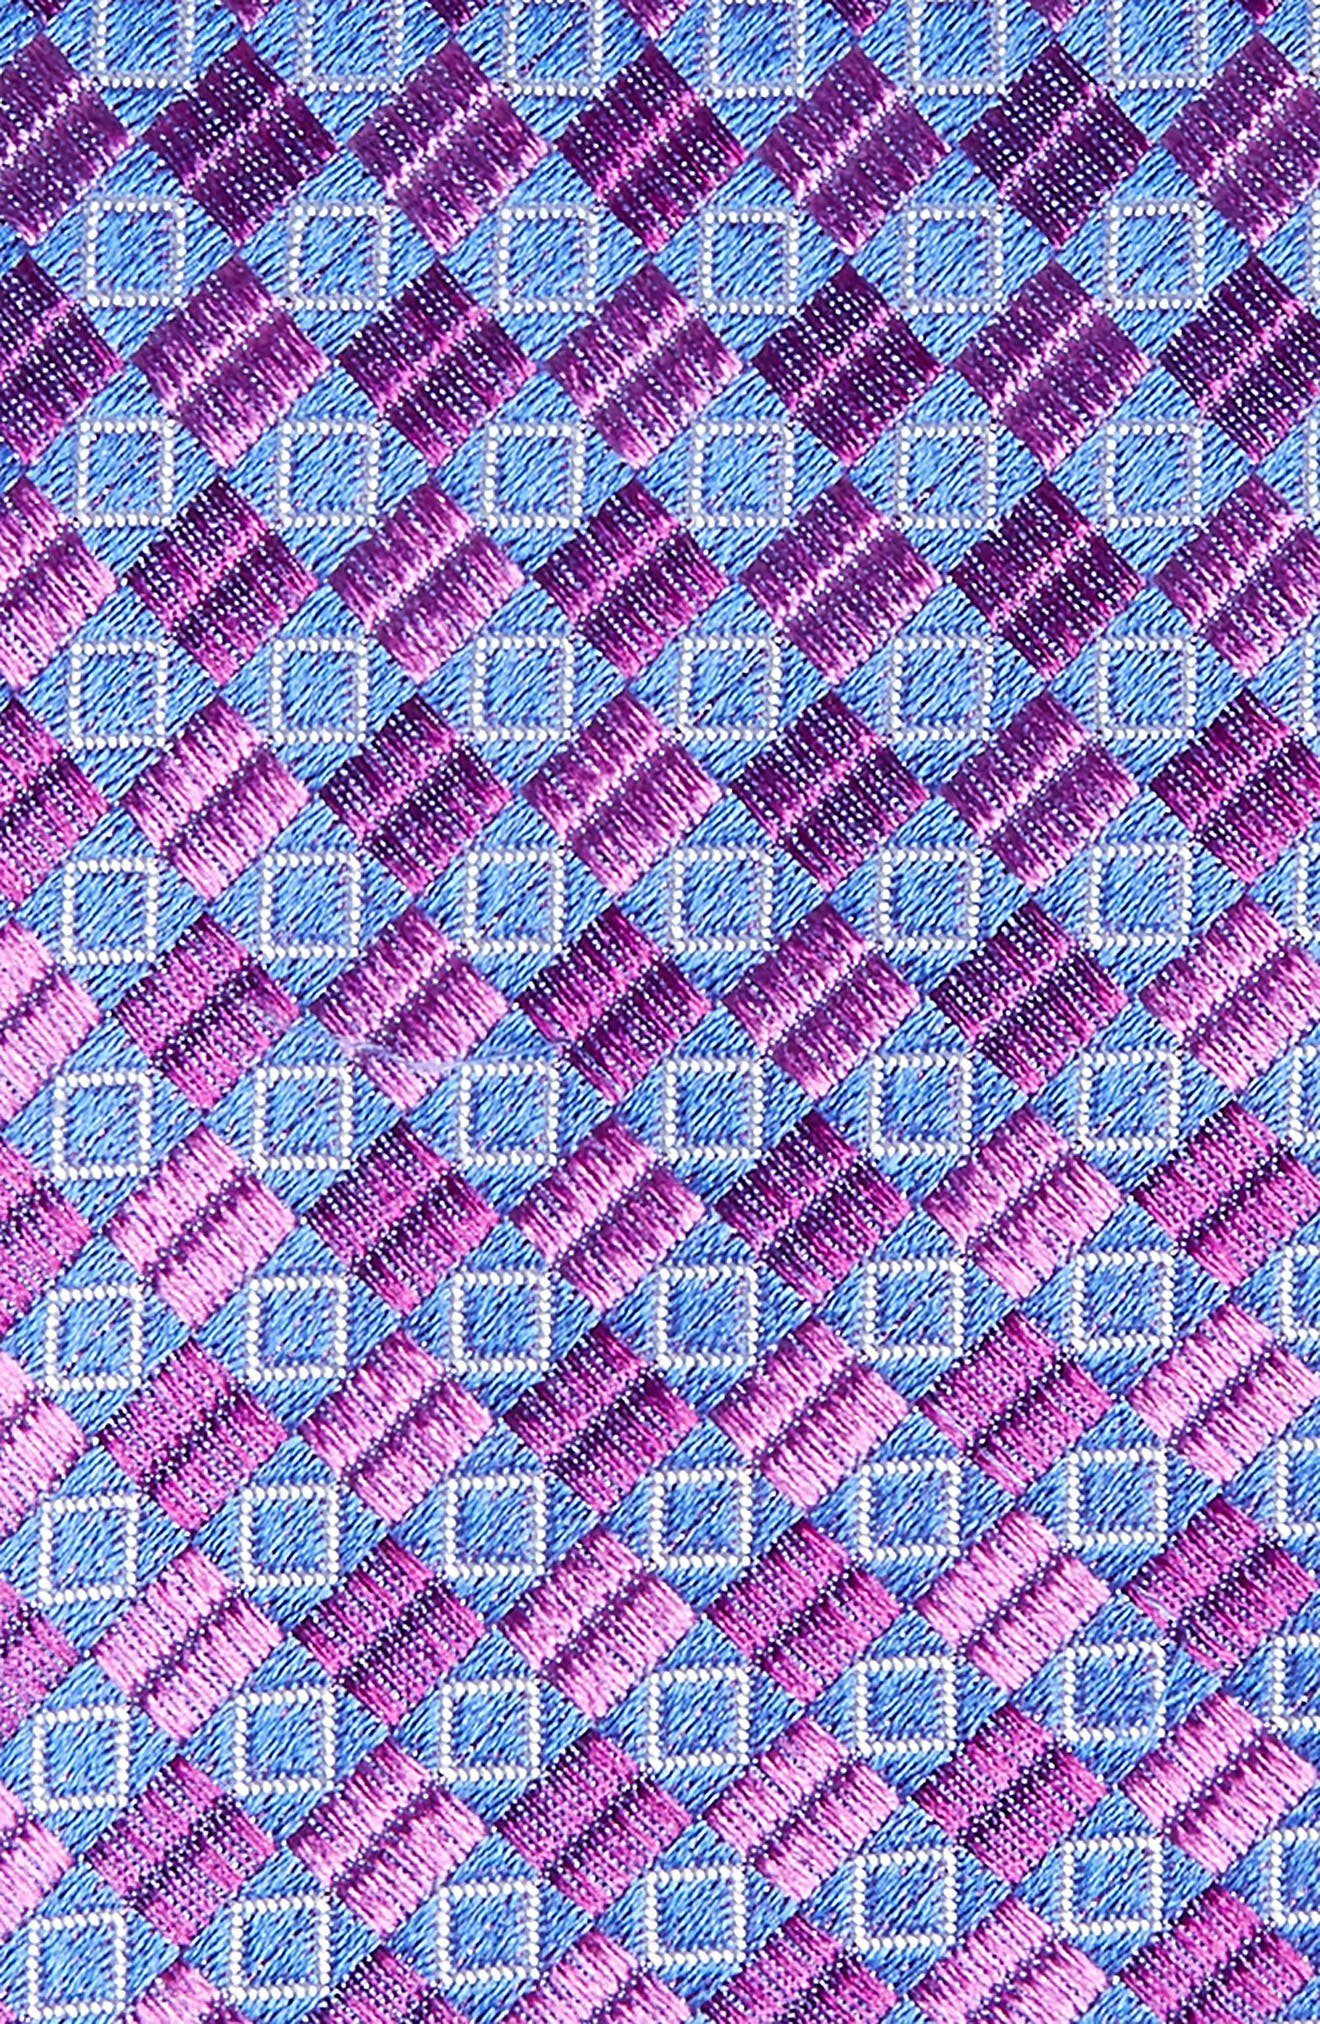 Middletown Geometric Silk Tie,                             Alternate thumbnail 8, color,